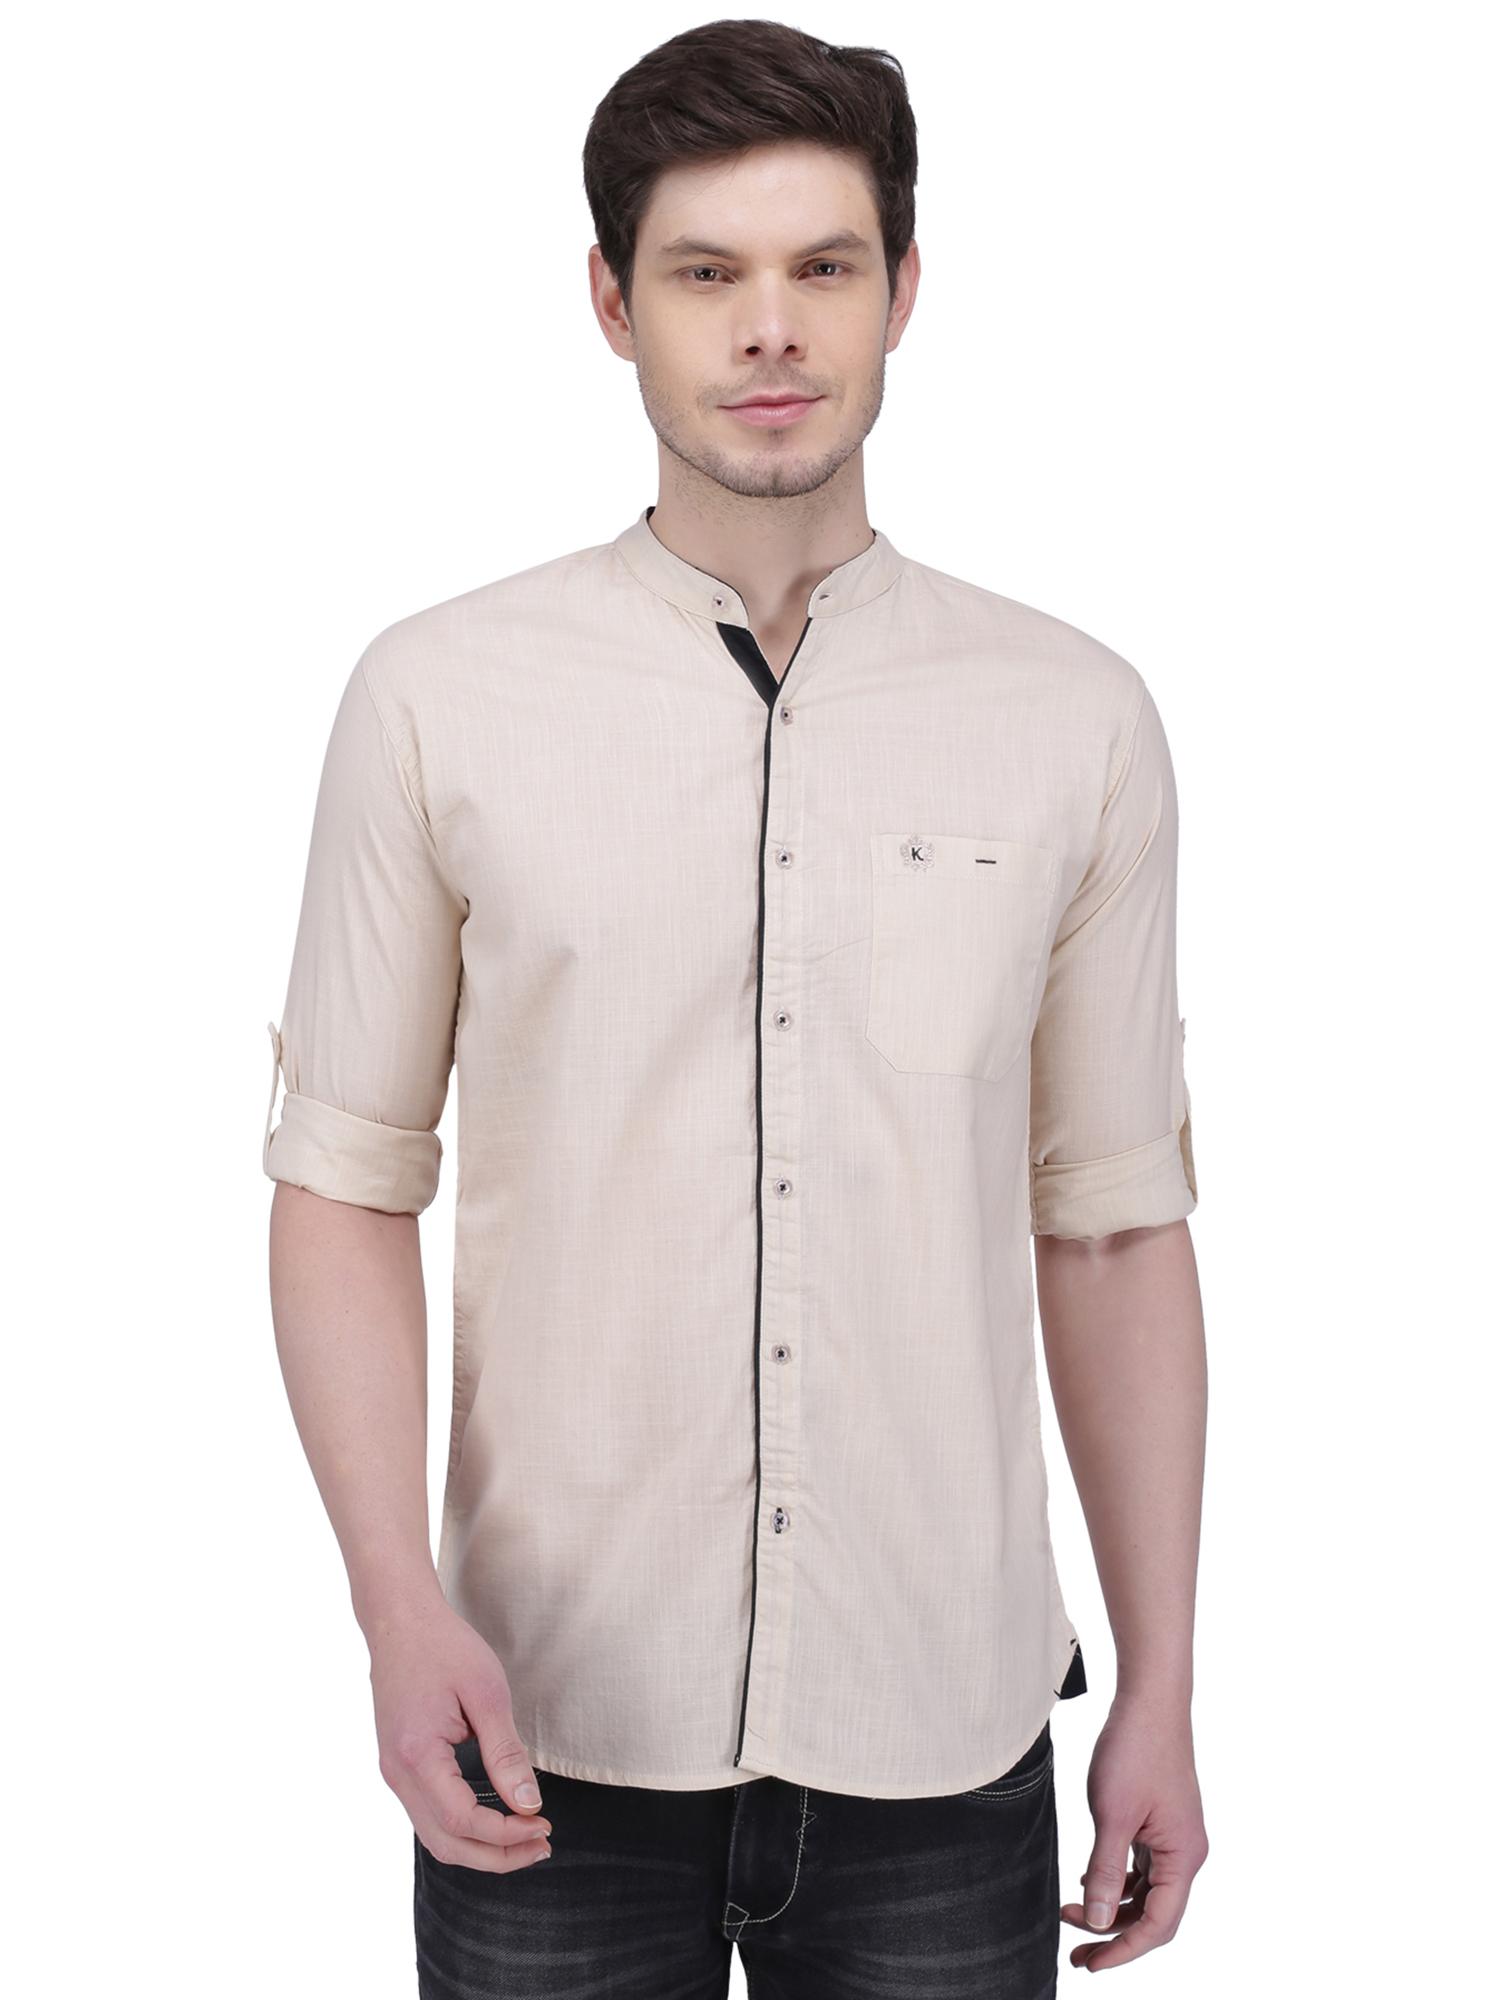 Kuons Avenue | Kuons Avenue Men's Light Beige Linen Cotton Casual Shirt- KACLFS1290BE